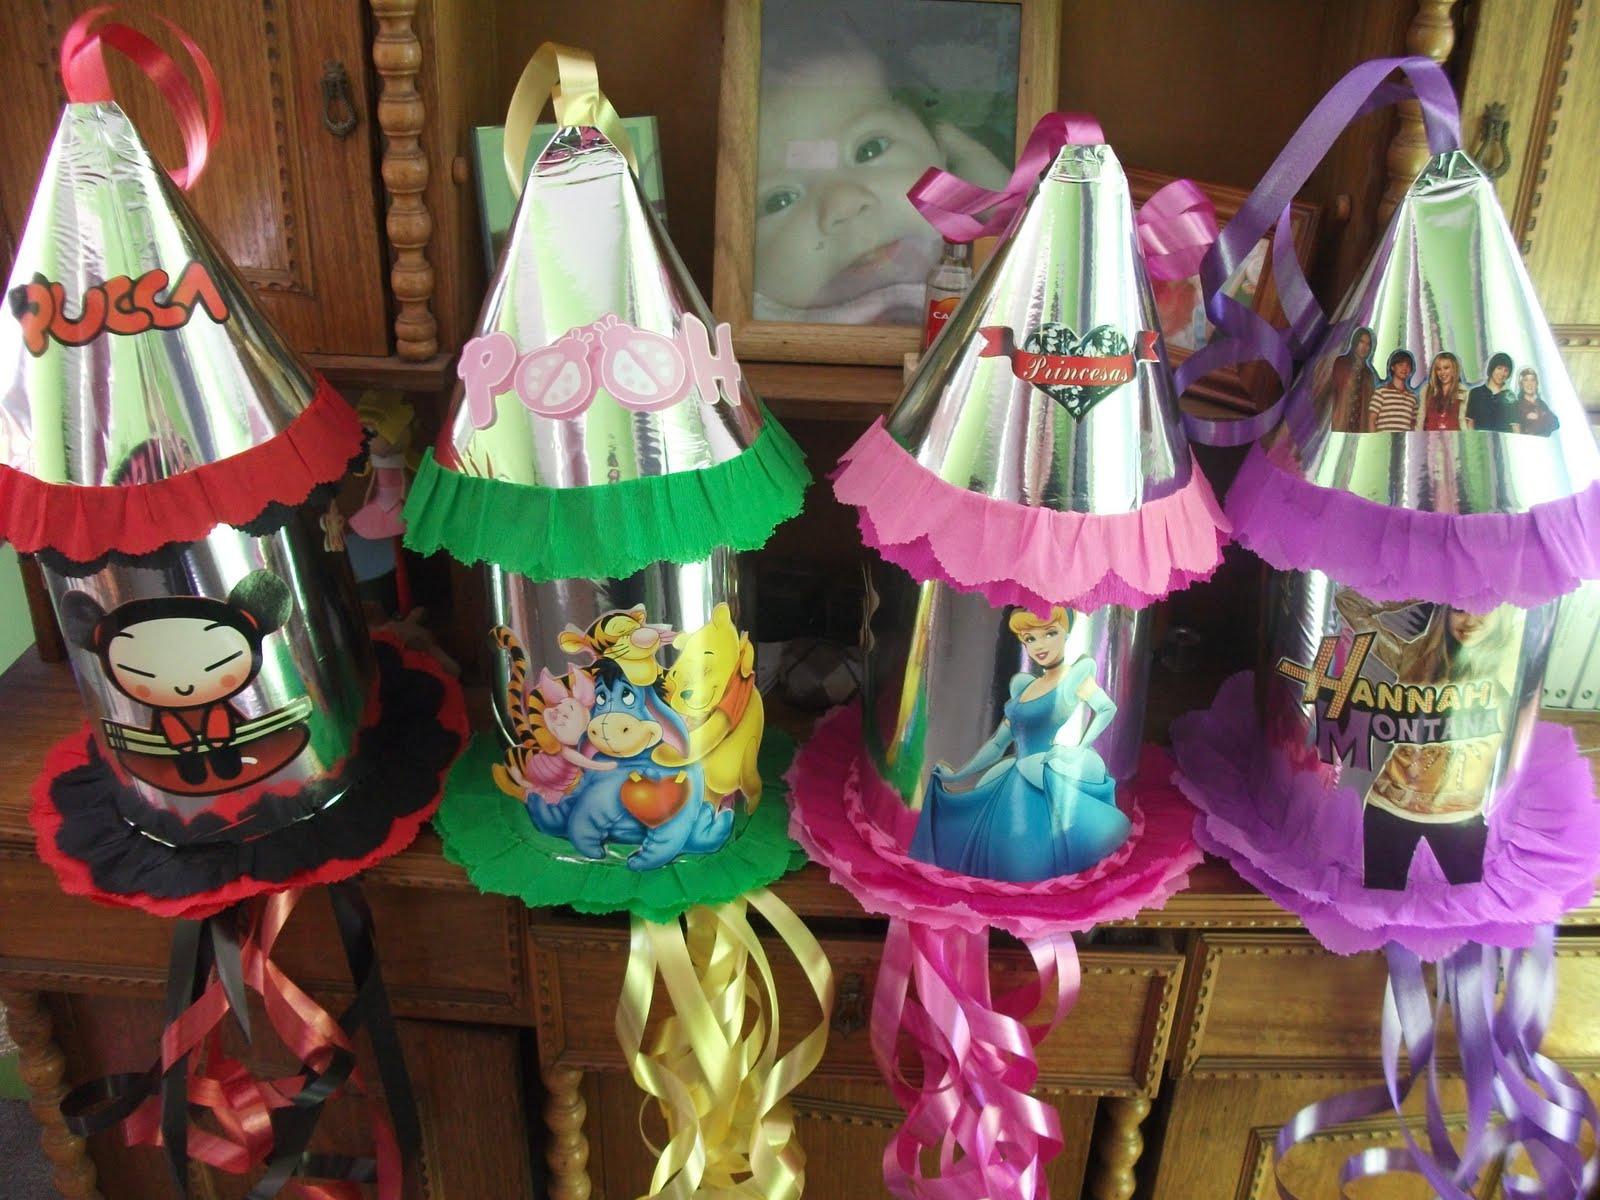 Blogs de Todo: Mis Piñatas de Cohete (Hanna Montana, Winnie Pooh ...